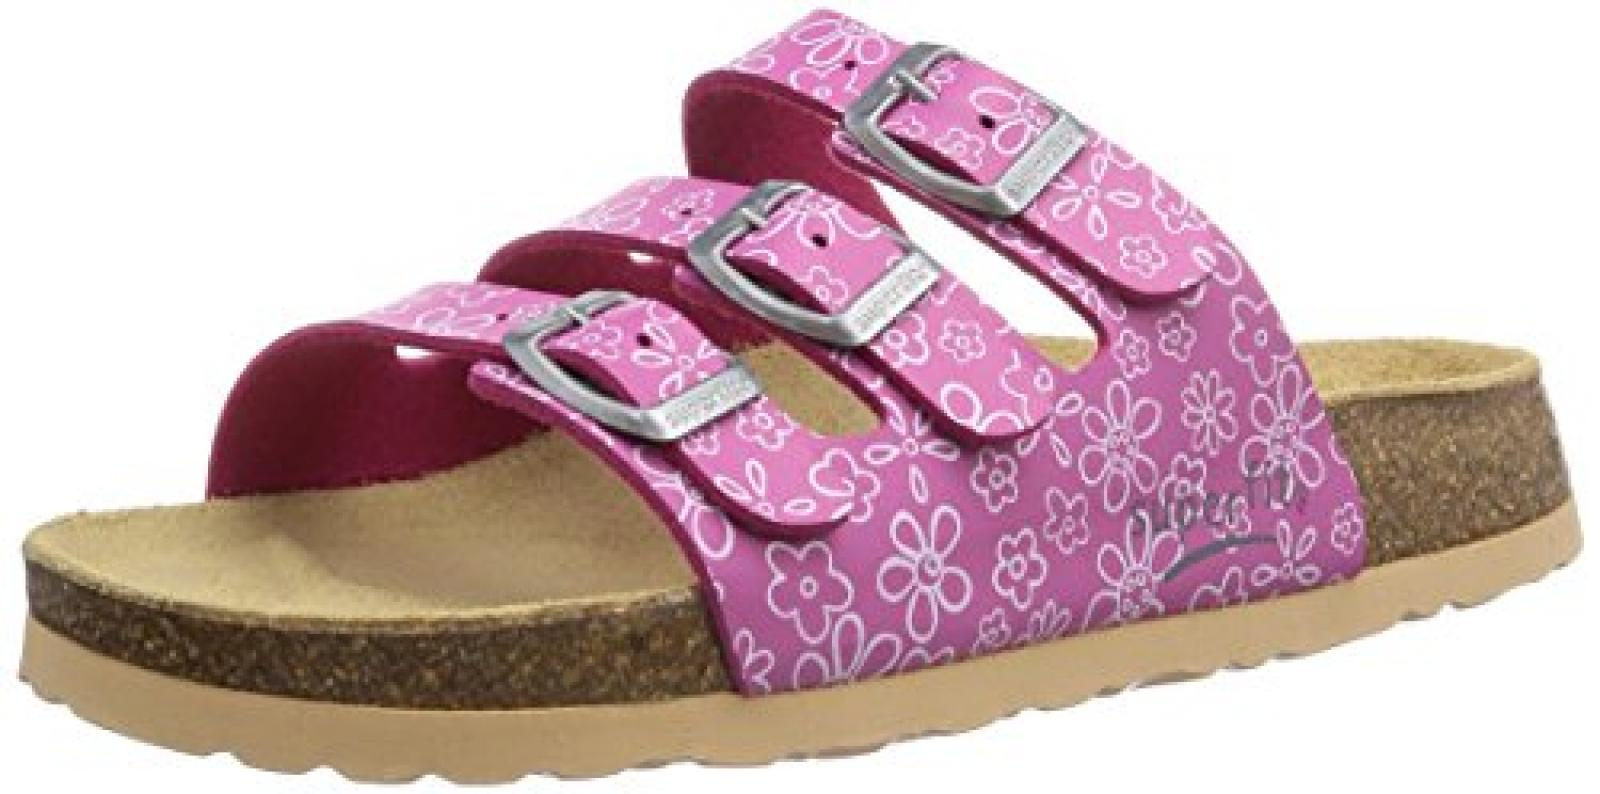 Superfit FUSSBETTPANTOFFEL 4001 Mädchen Pantoffeln